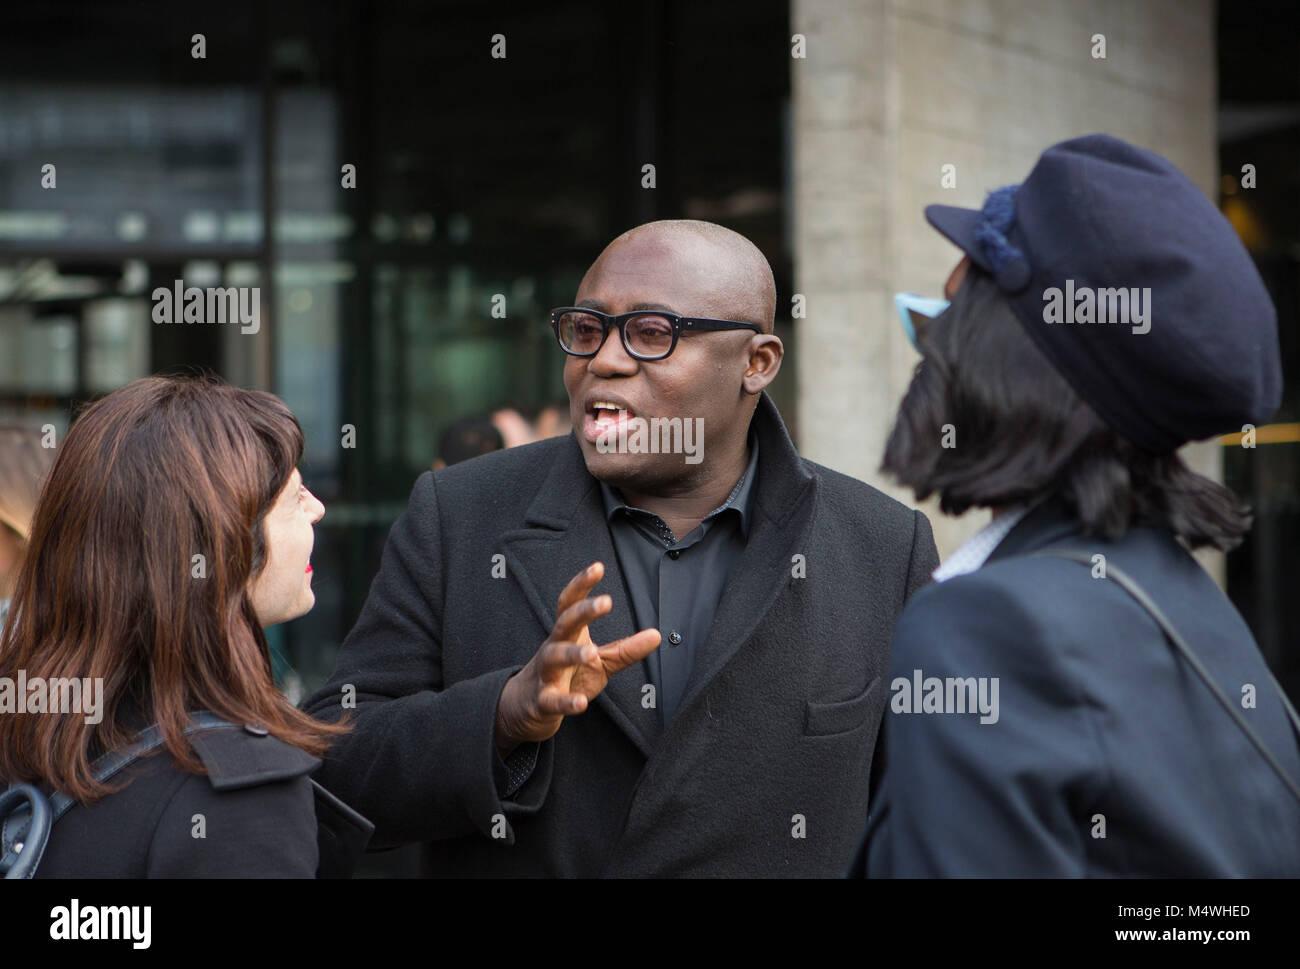 abdd43c4be British Vogue editor Edward Enninful dopo la Roland Mouret Autunno/Inverno  2018 London Fashion Week